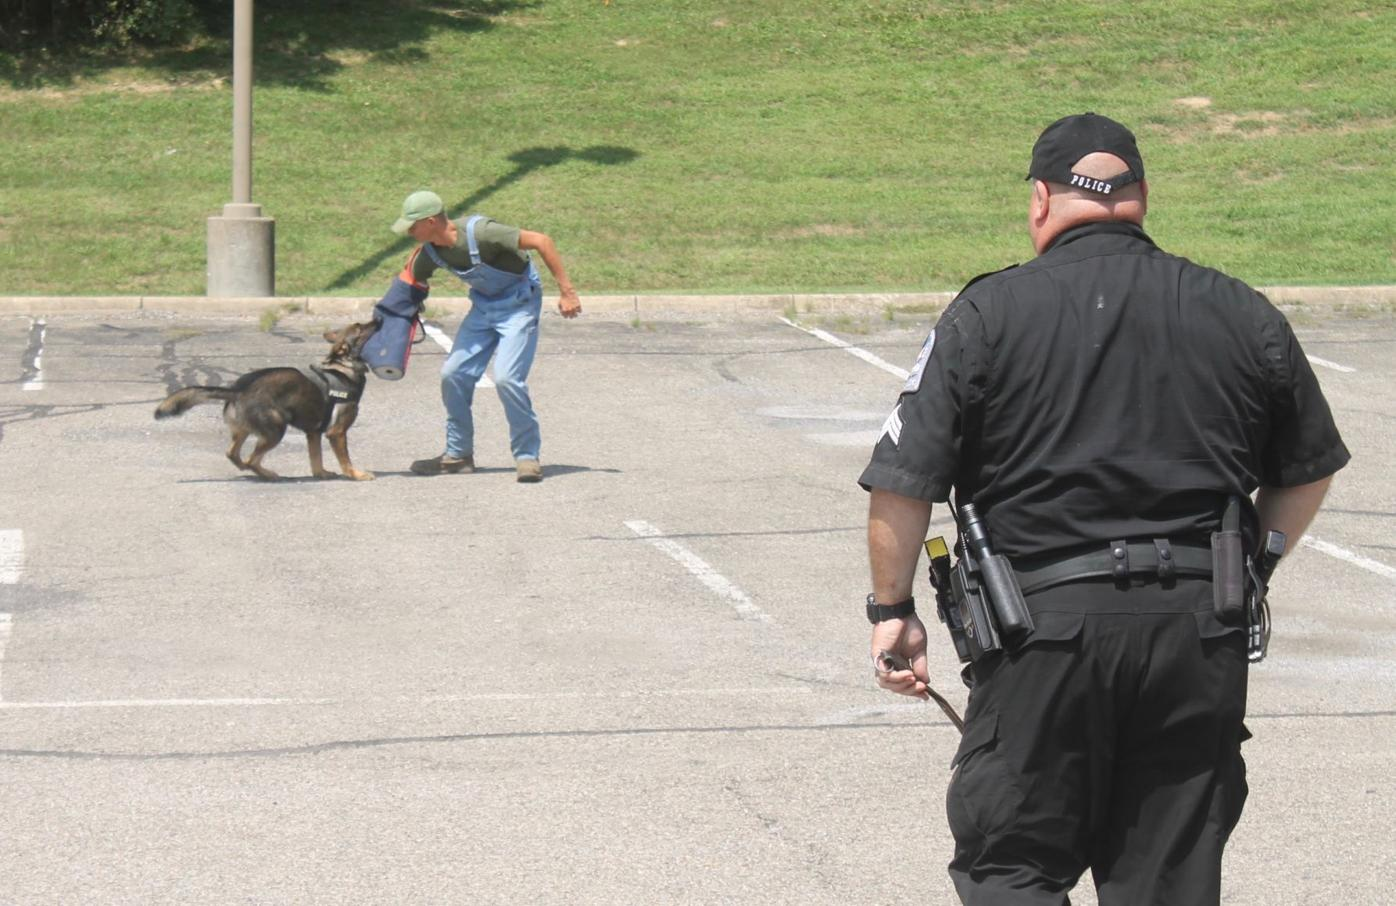 Dallas catching suspect